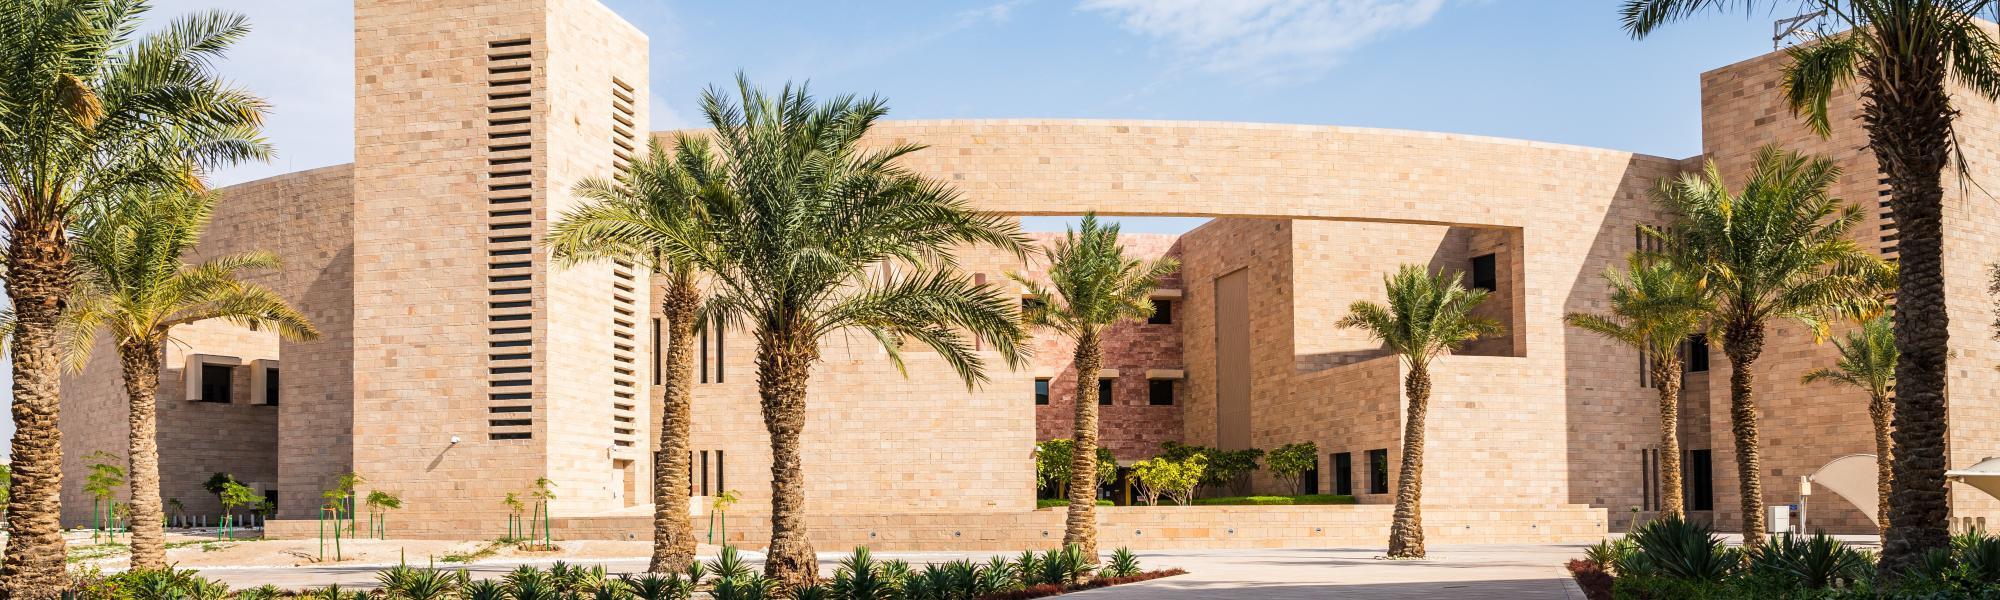 CMU-Qatar Library exterior image.